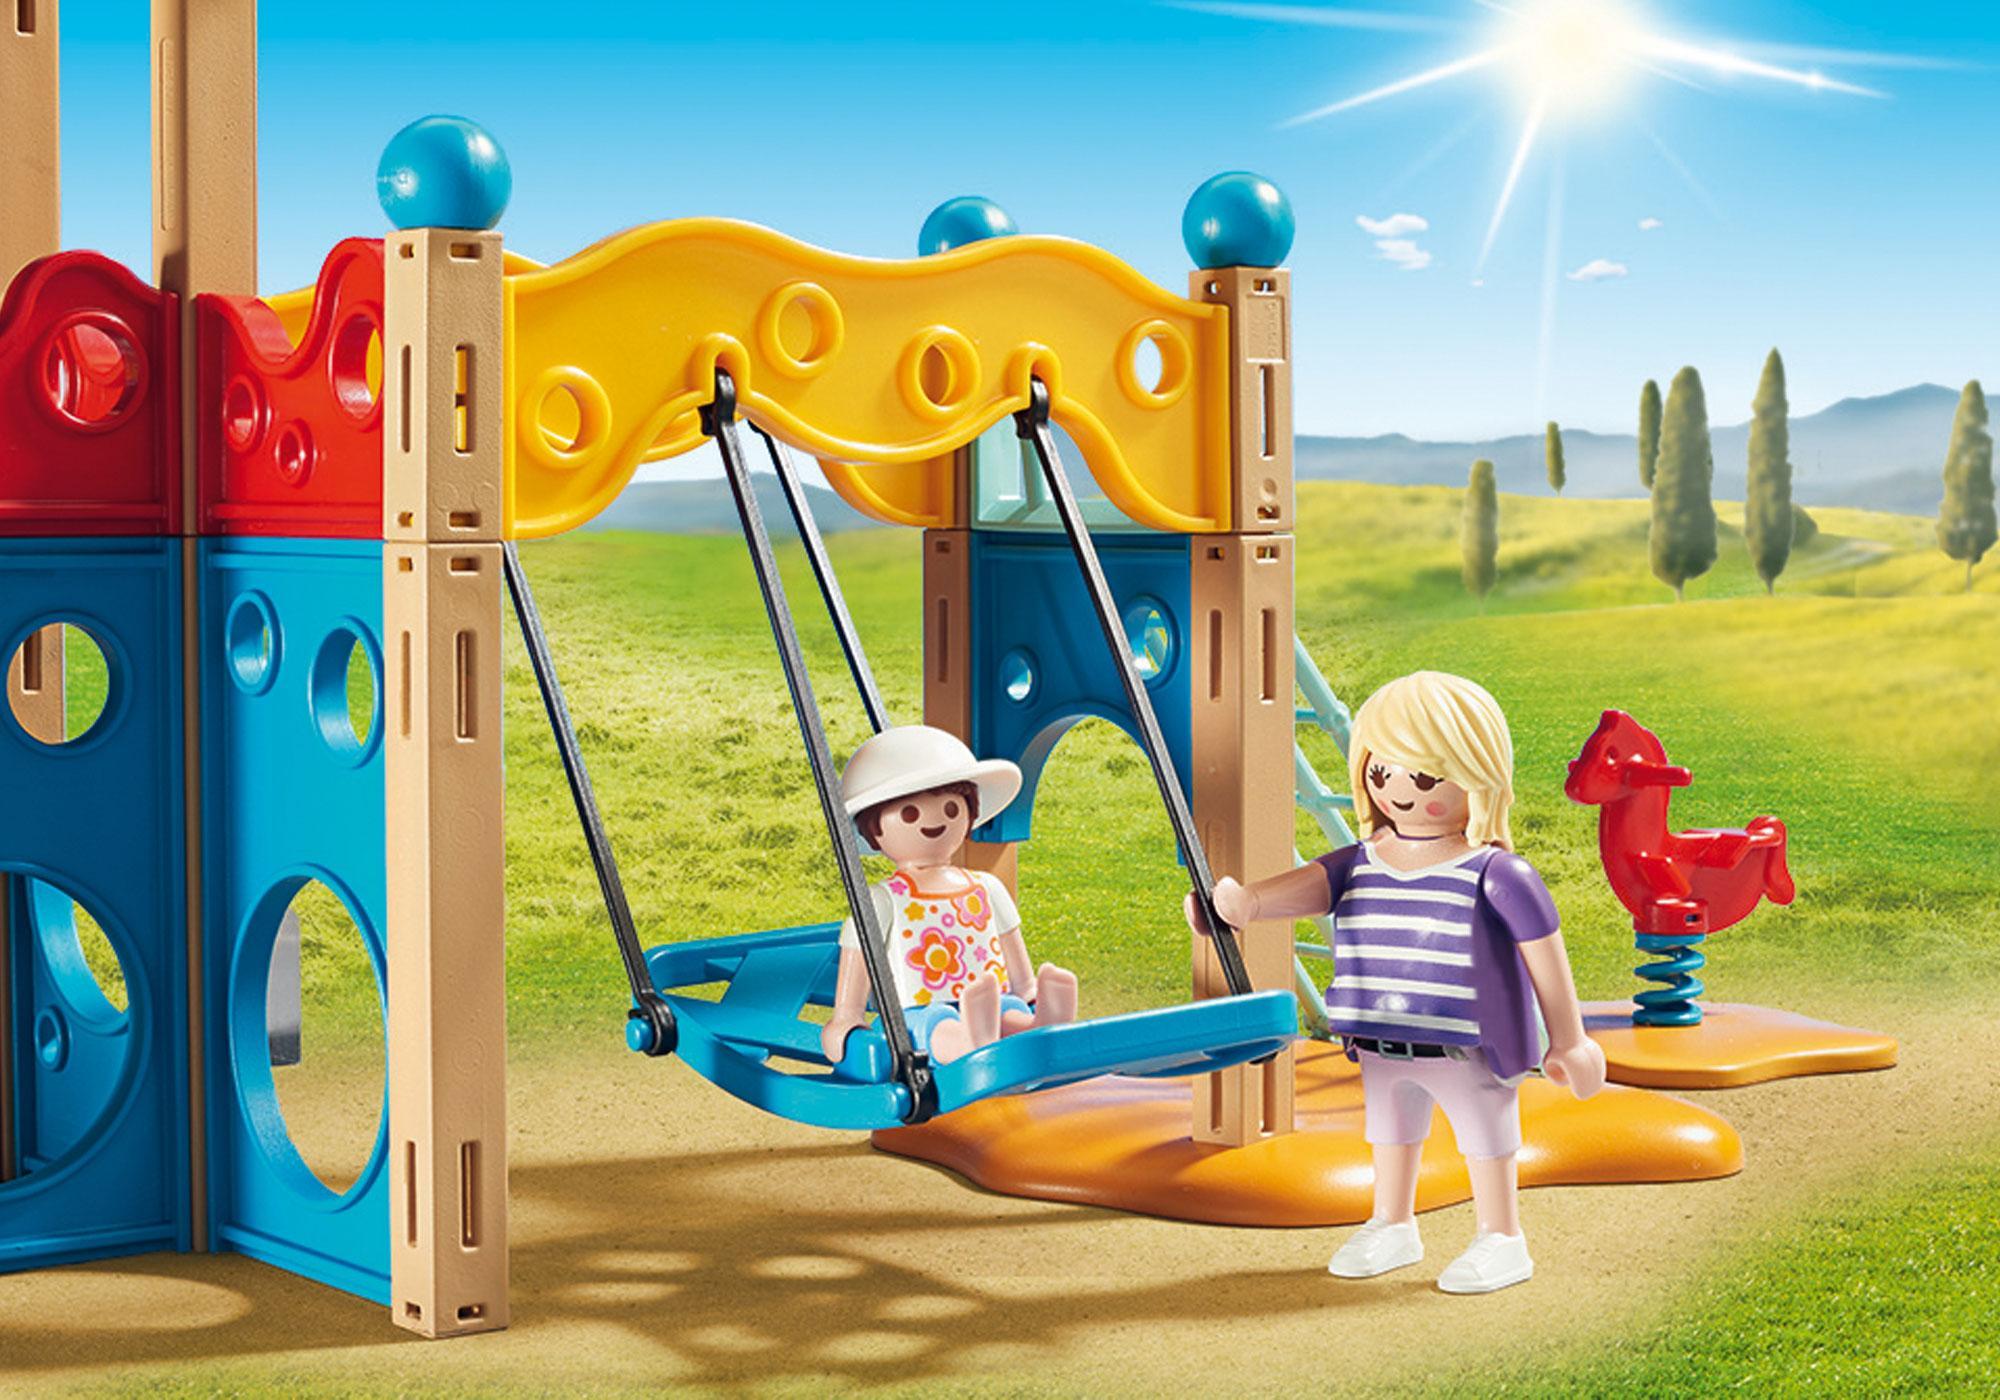 http://media.playmobil.com/i/playmobil/9423_product_extra3/Parc de jeu avec toboggan